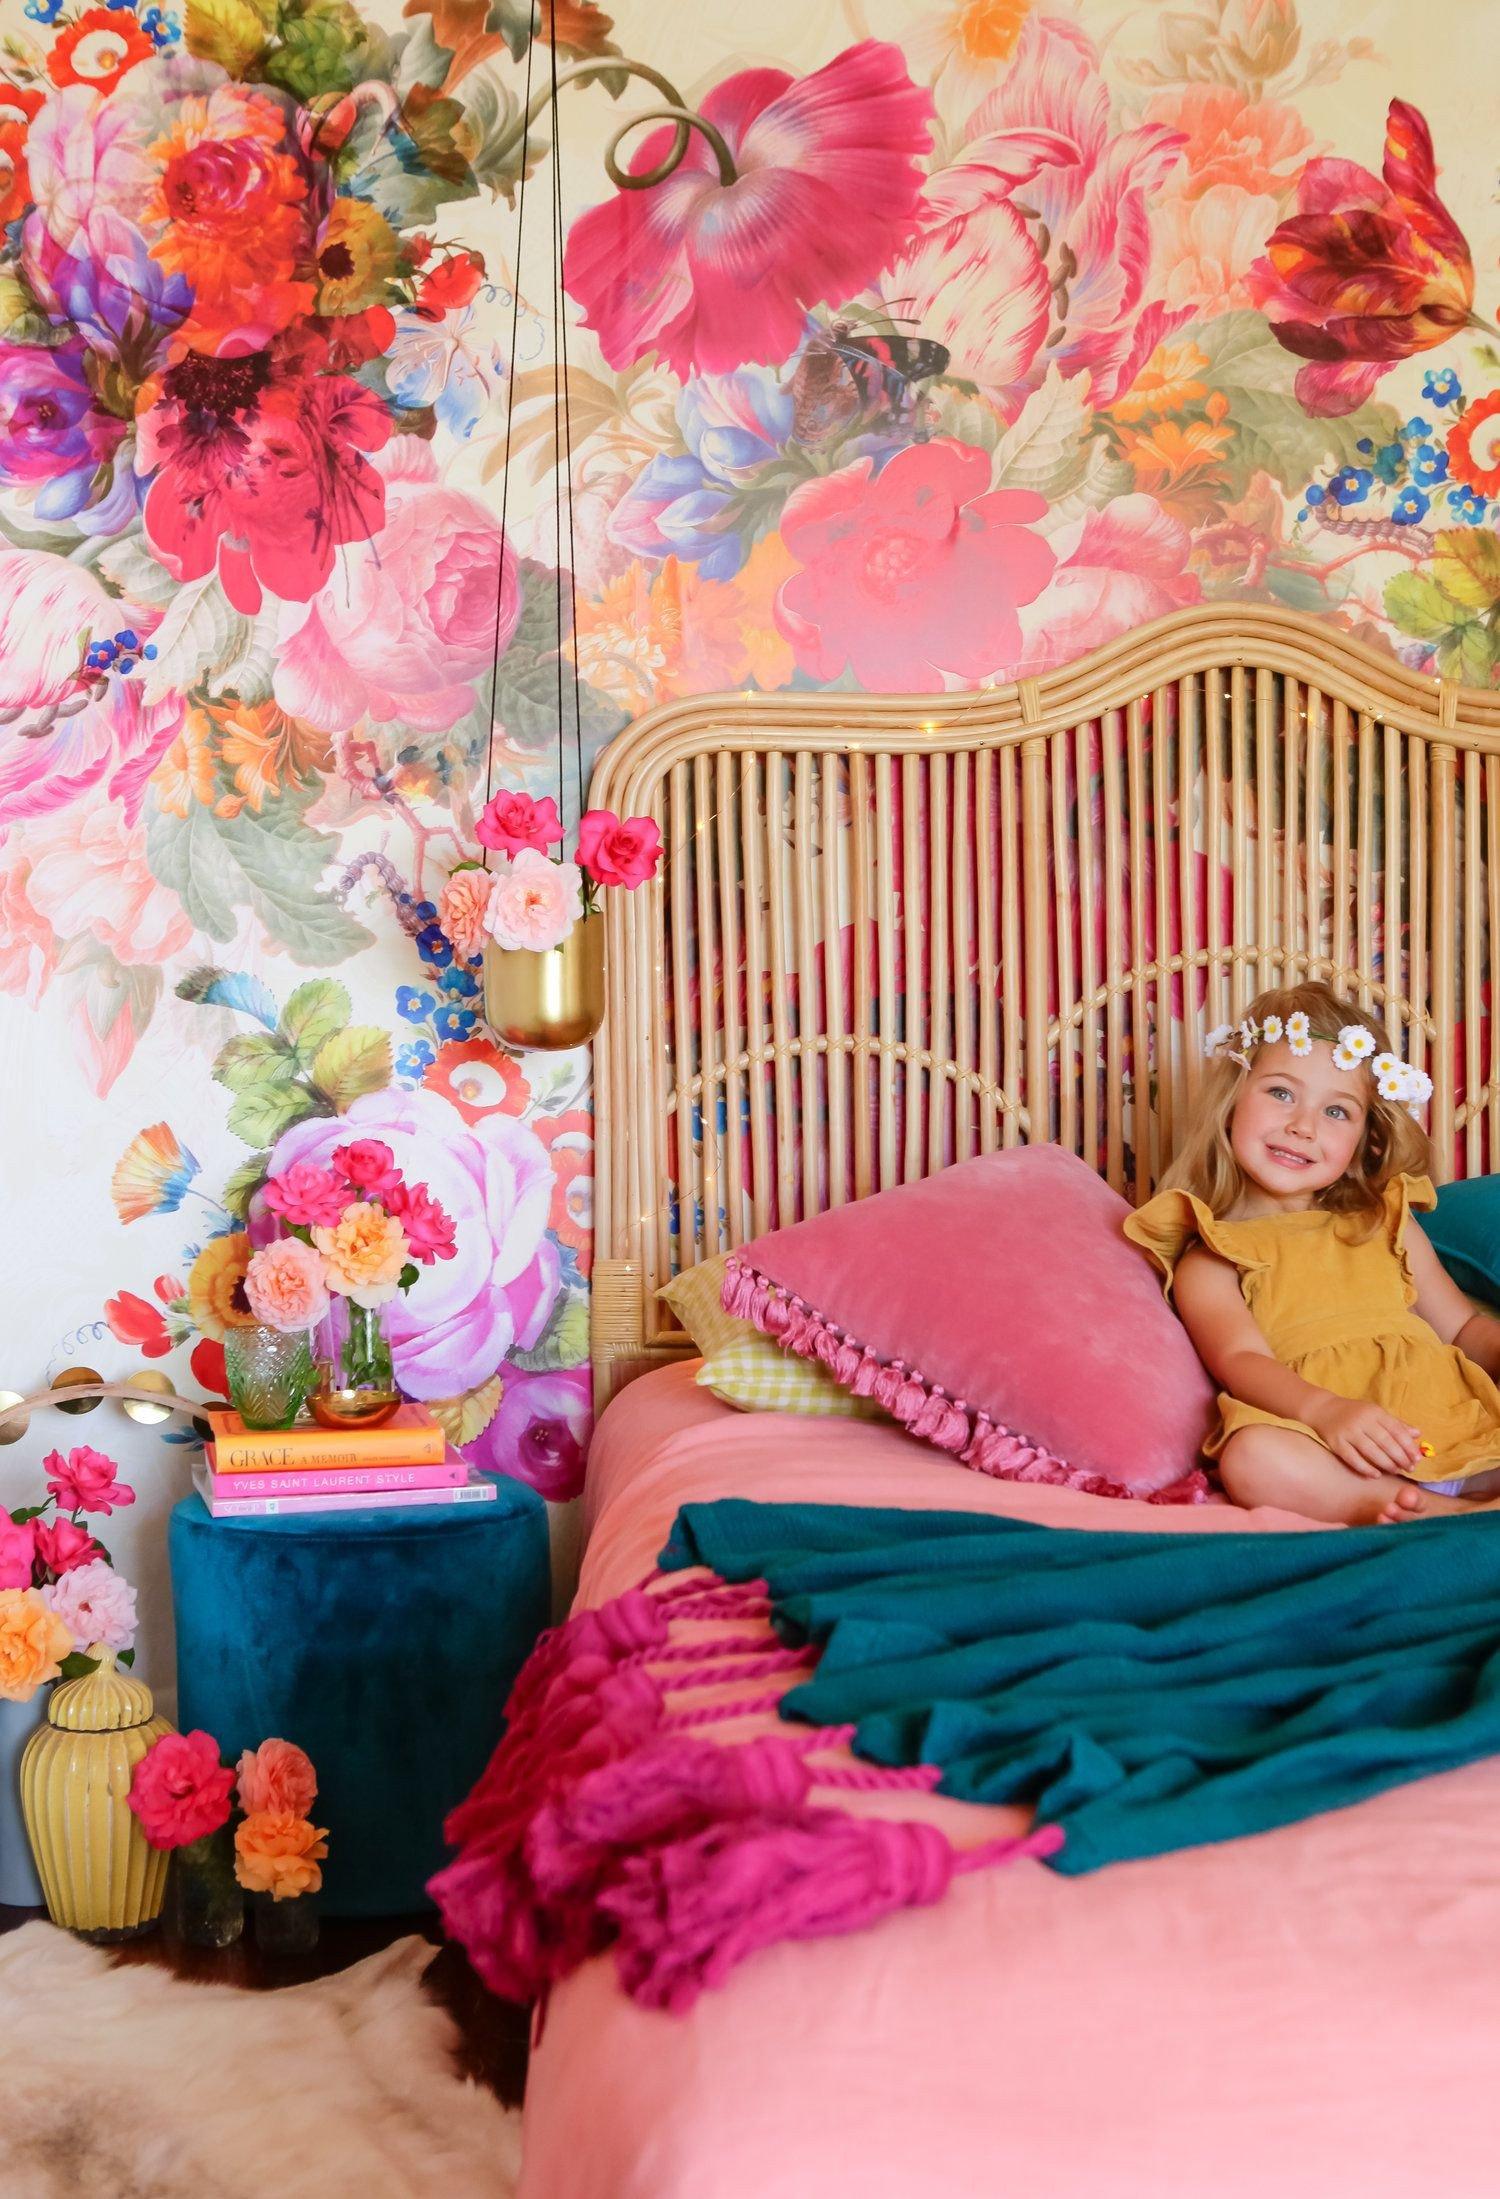 Wallpapers for Girls Bedroom Best Of Pin by Janae Johnson Sureja On Vivi Bedroom